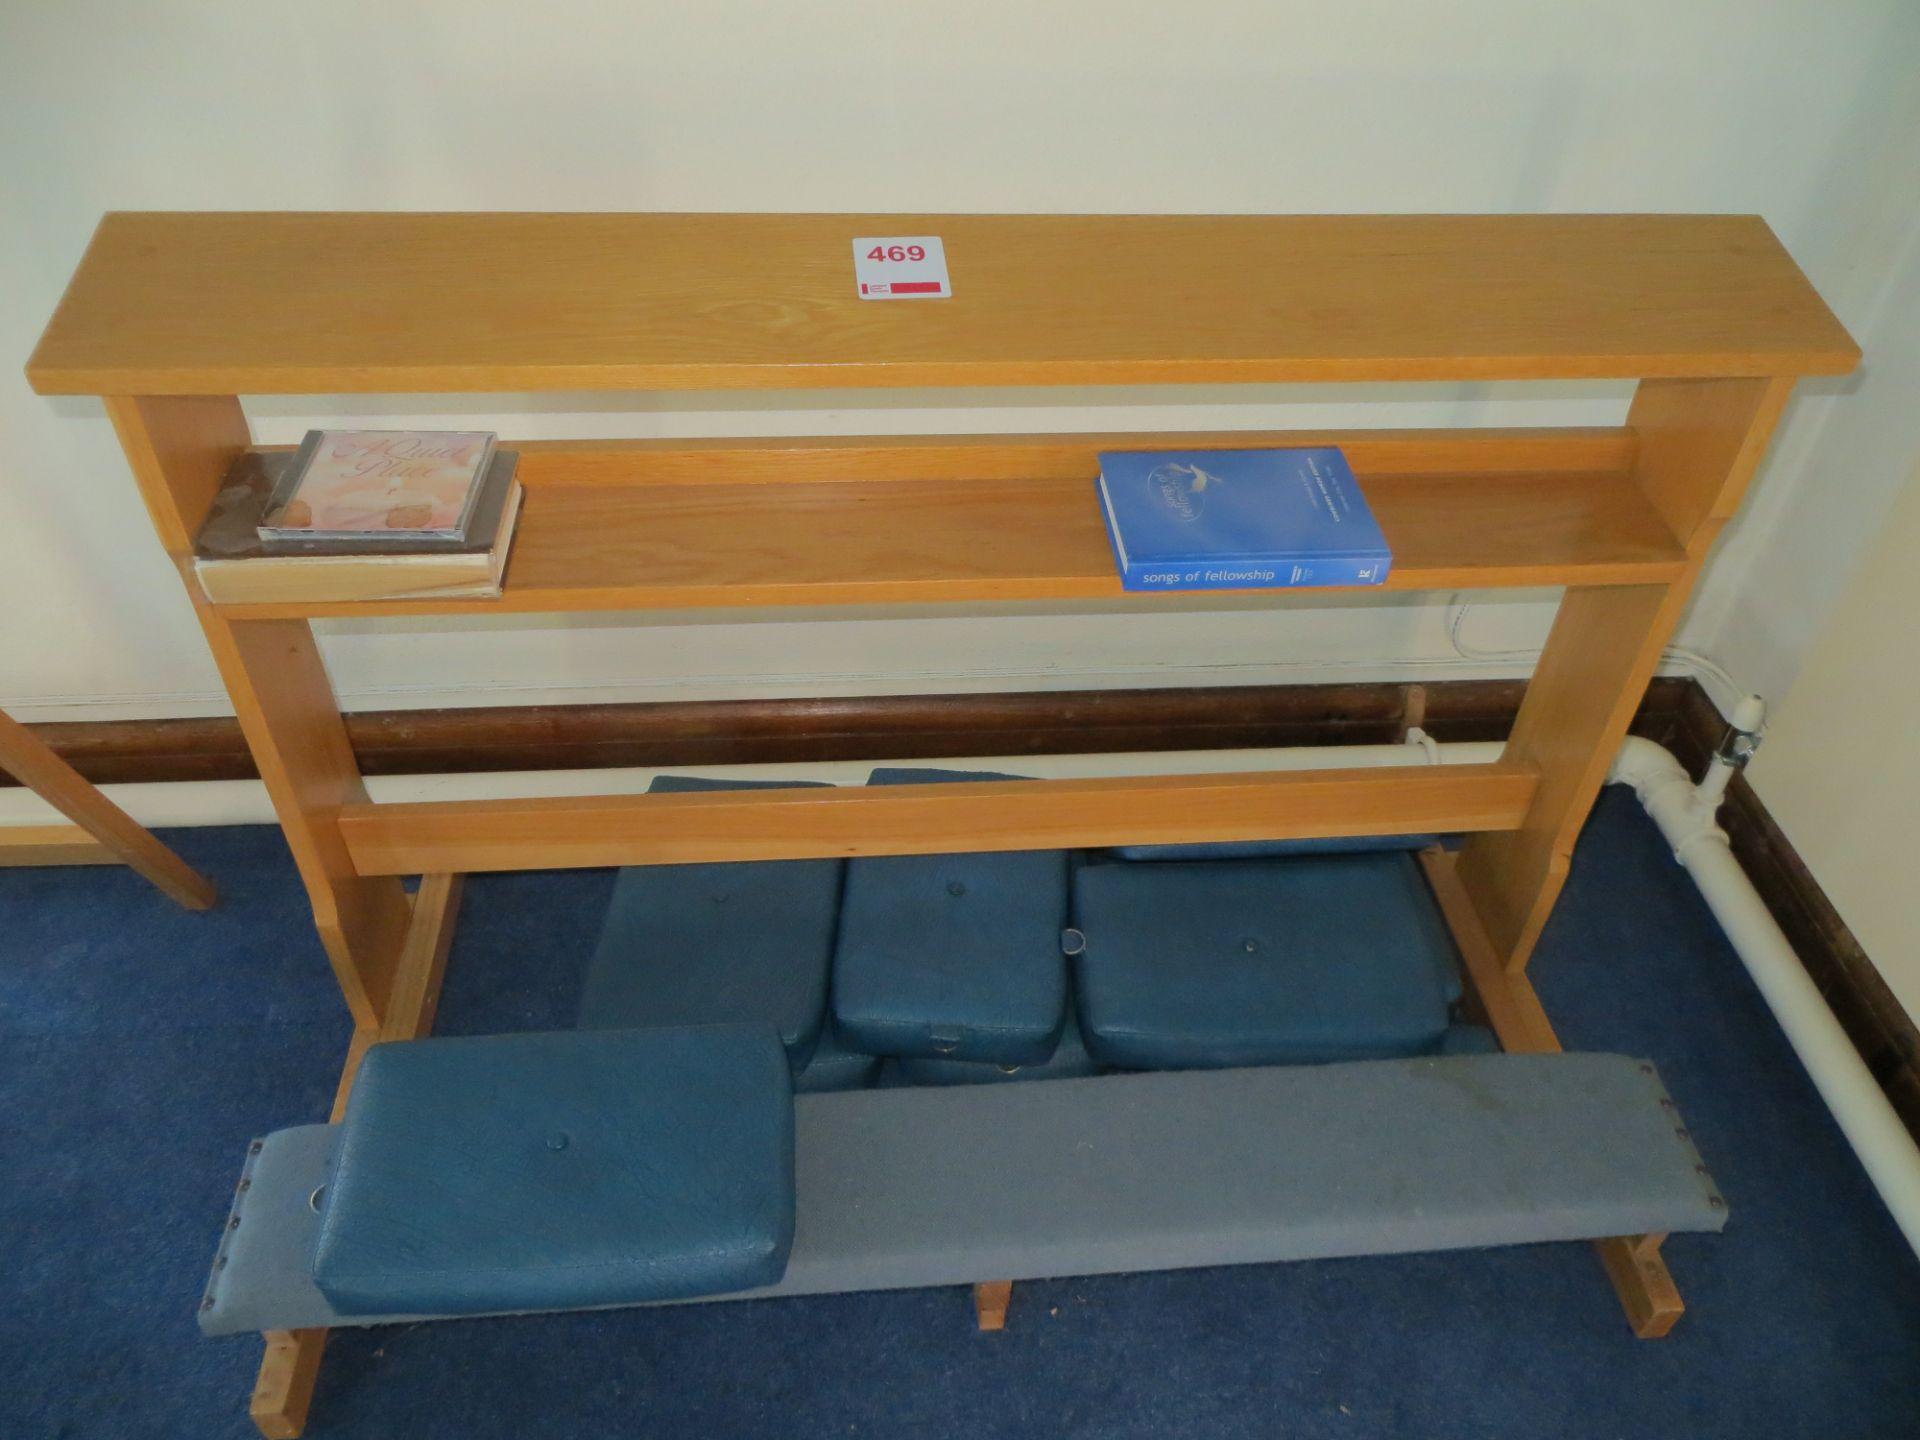 Lot 469 - Pray bench c/w 6 kneeling pads